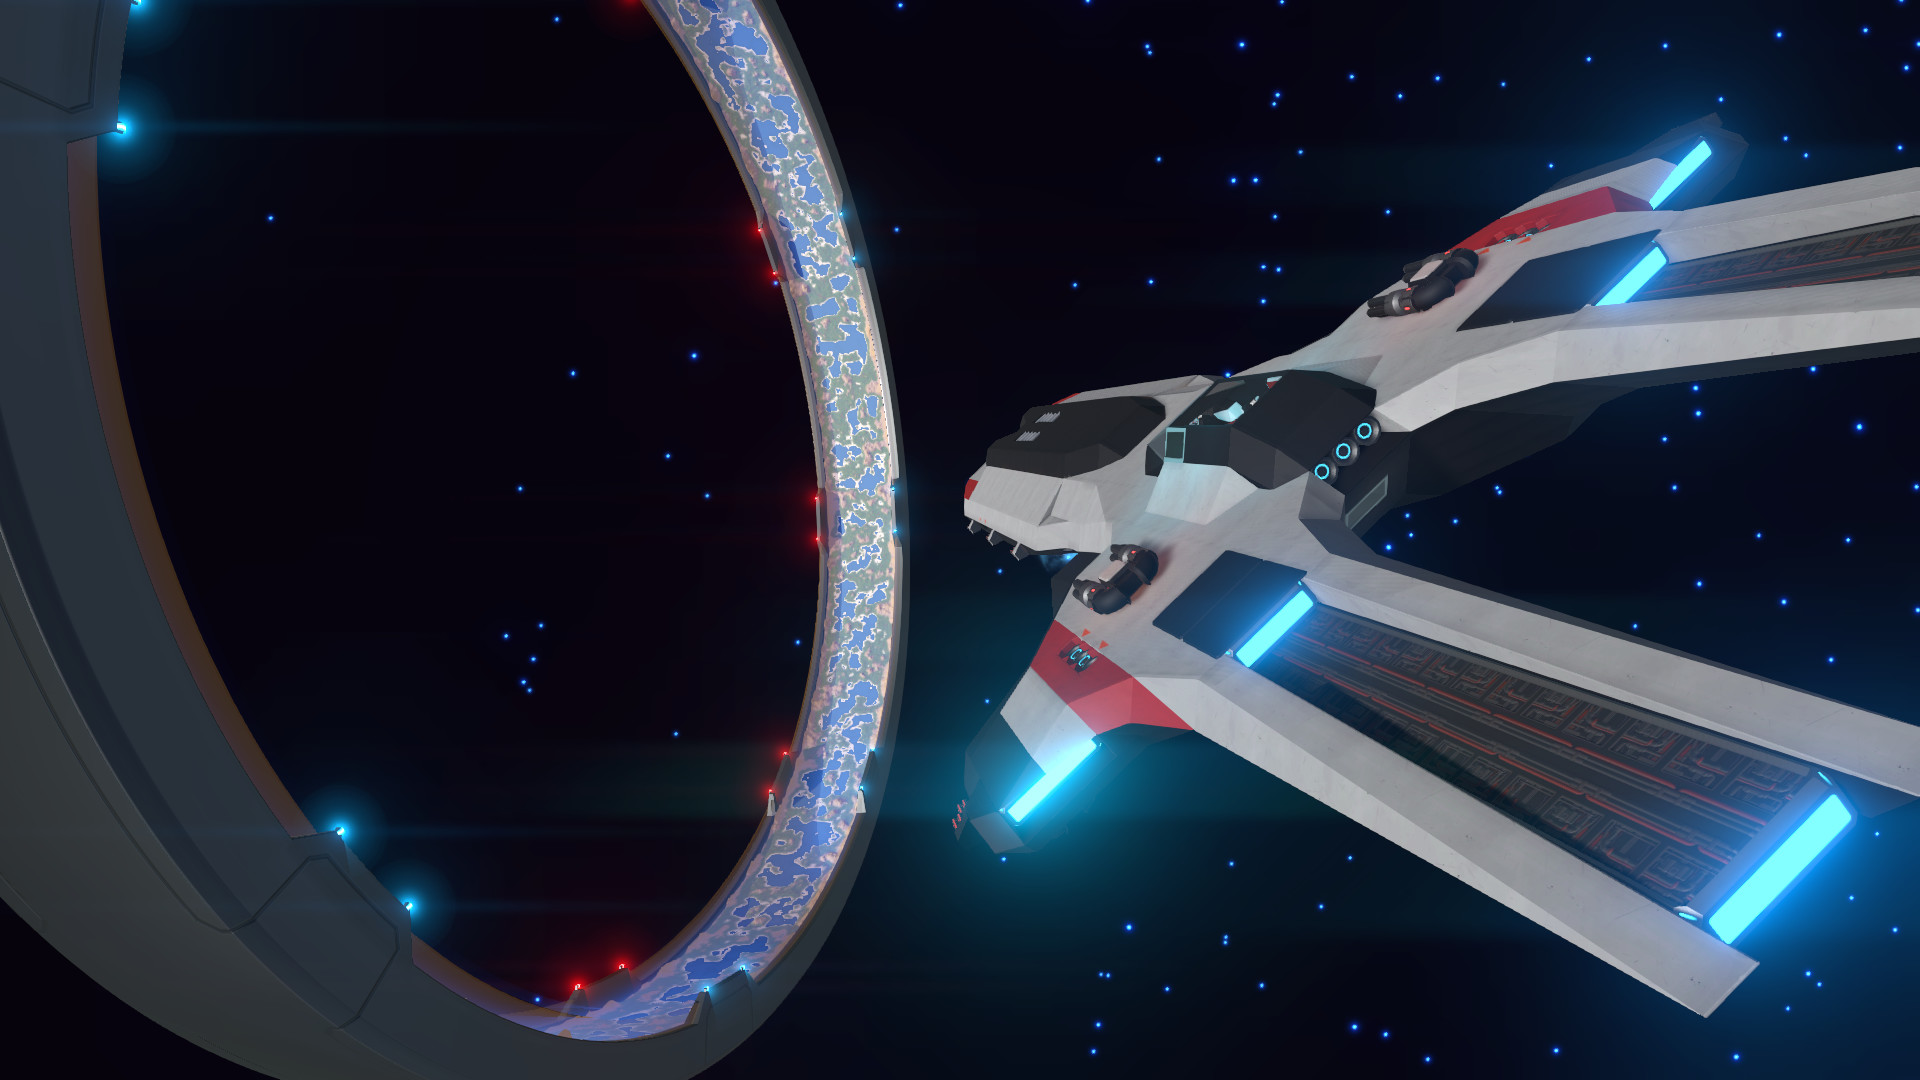 Find the best laptops for Starship EVO